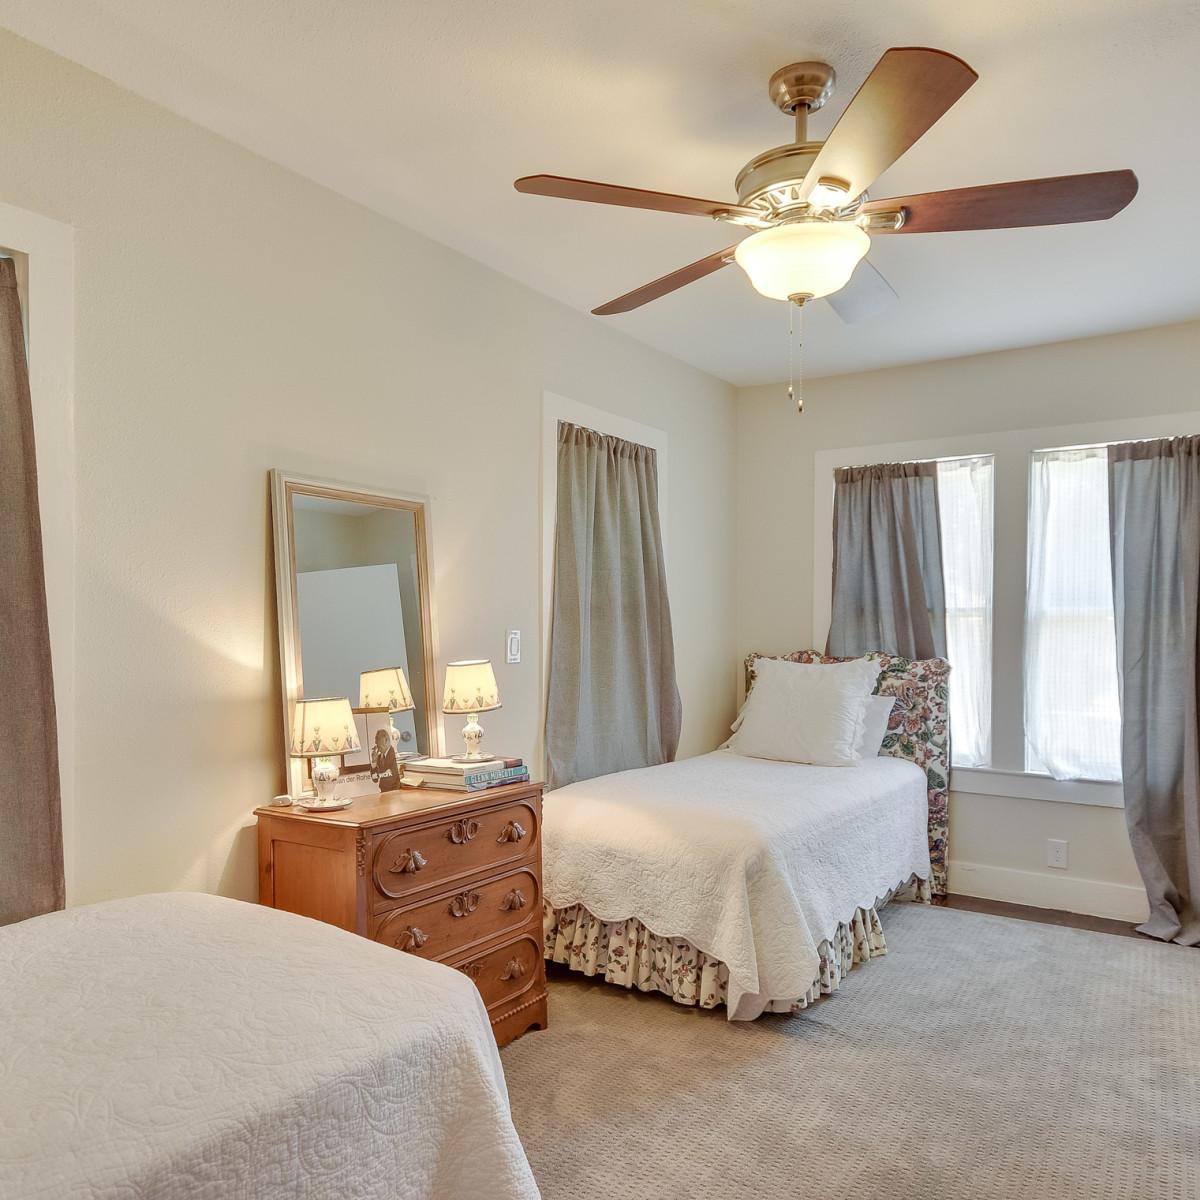 423 Queen Anne San Antonio house for sale bedroom